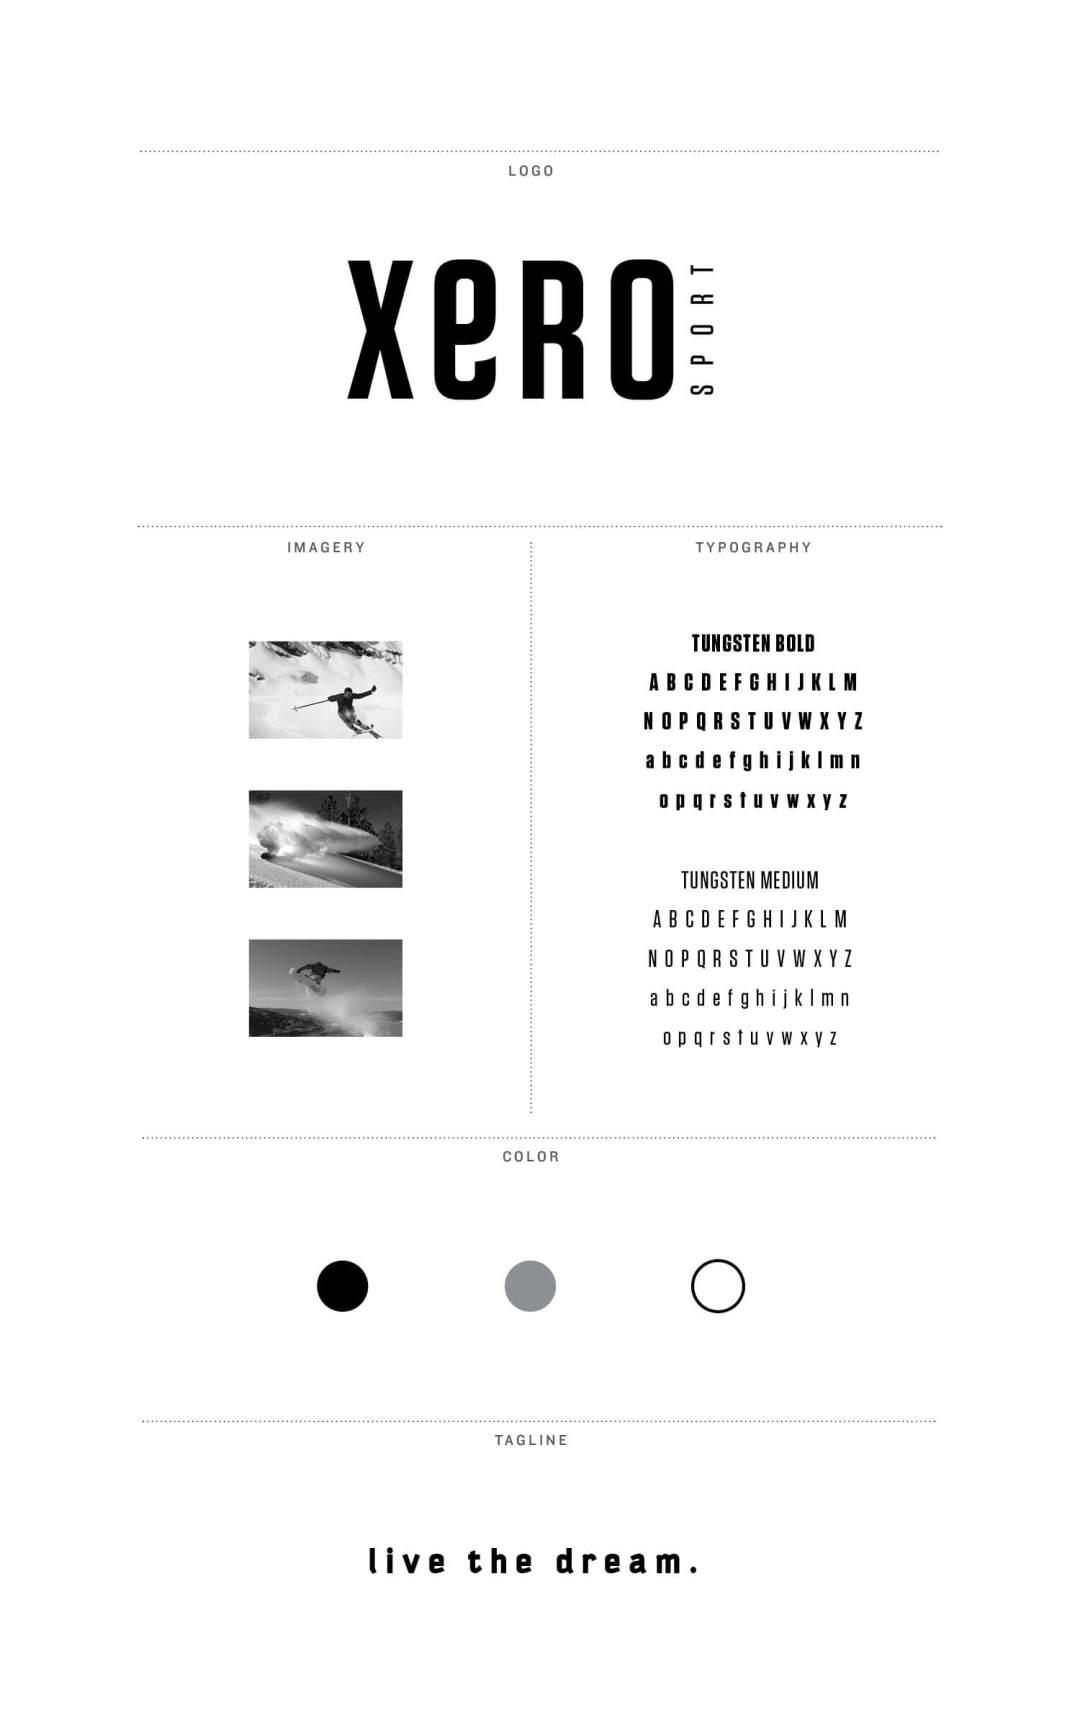 Branding Board XERO